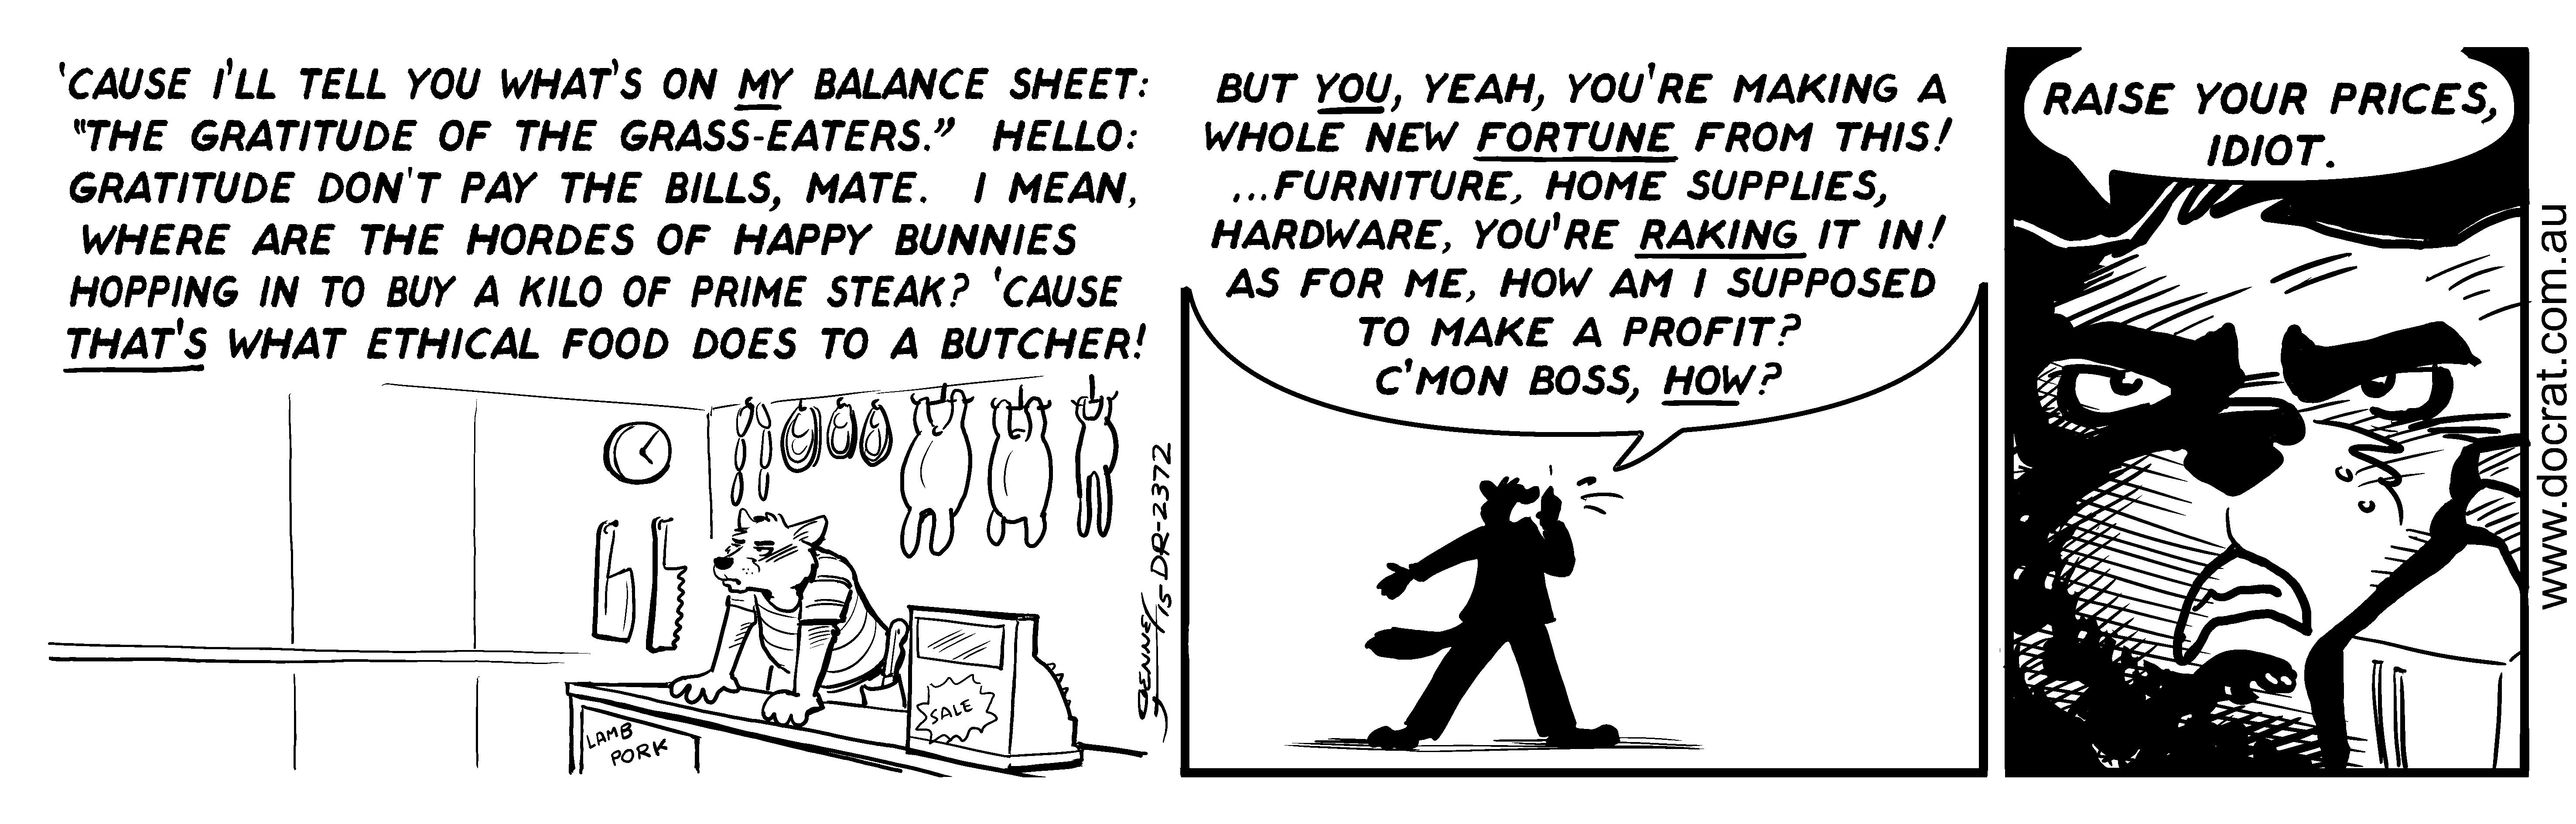 20151013